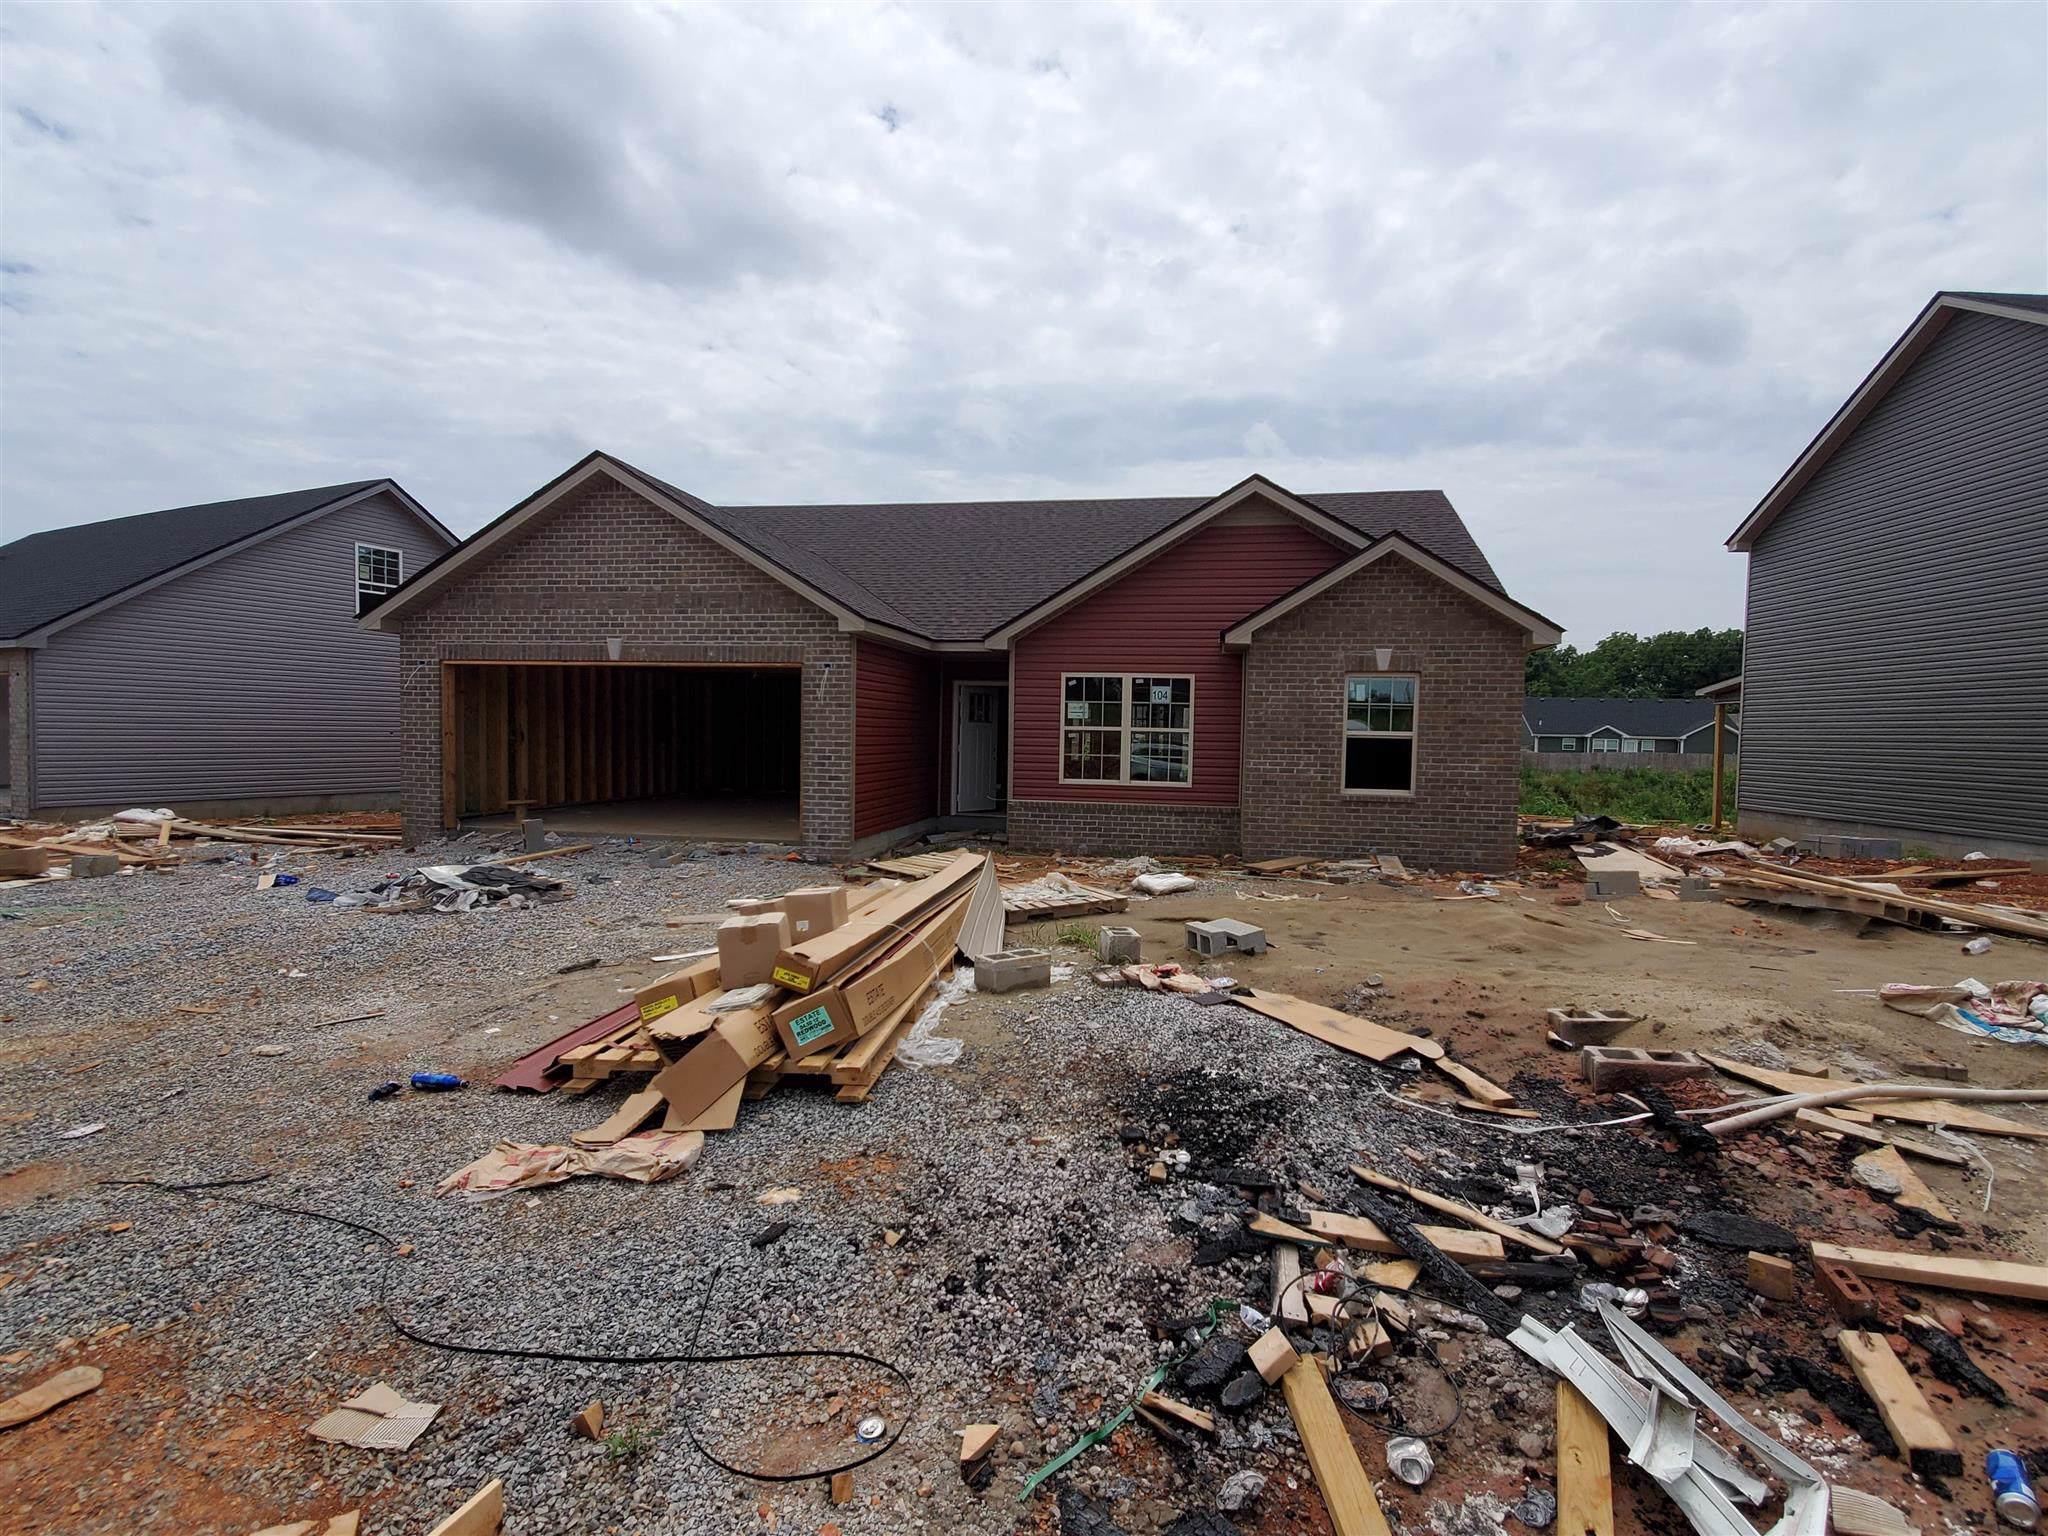 104 Rose Edd Estates, Oak Grove, KY 42262 (MLS #RTC2042137) :: Nashville on the Move